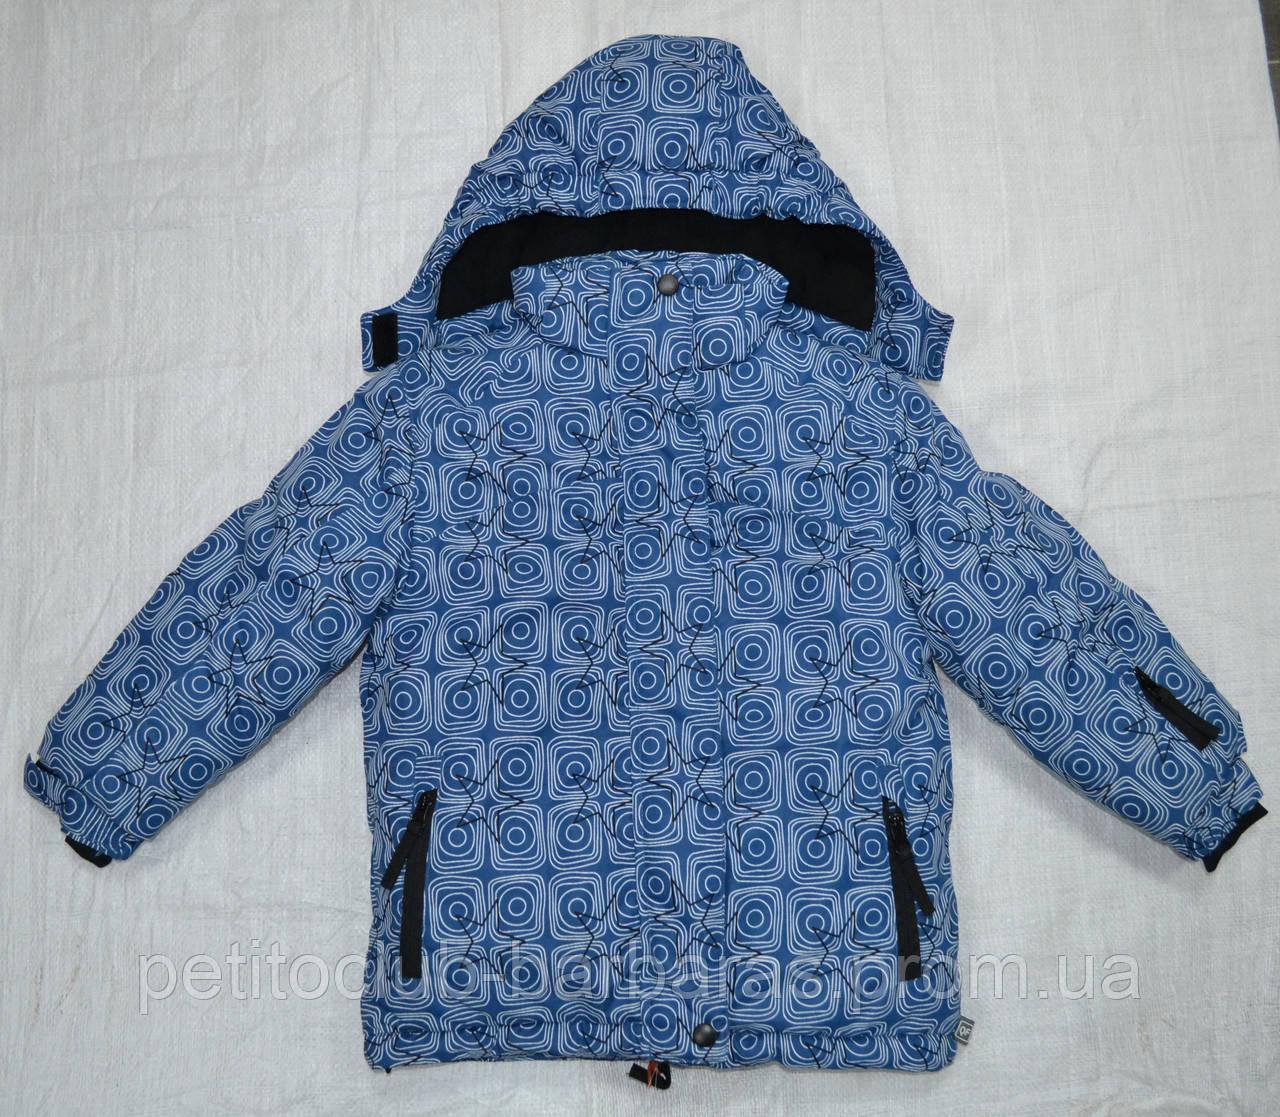 Куртка зимняя для девочки темно-синяя (Quadrifoglio, Польша)